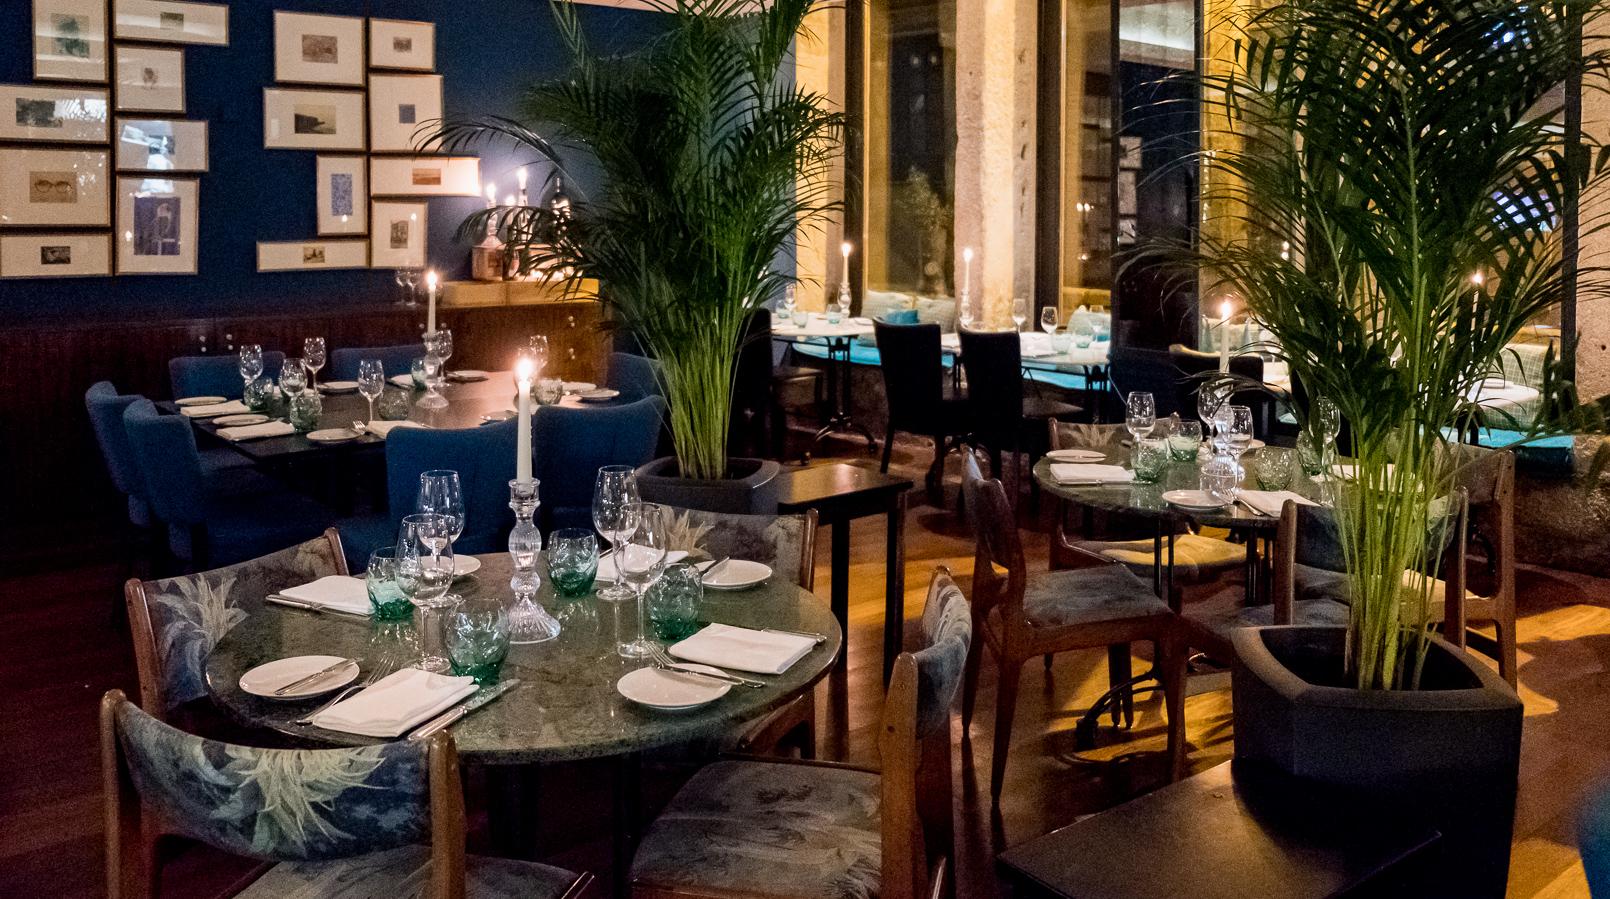 Le Fashionaire Onde jantar na passagem de ano: RIB Beef & Wine rib beef wine pestana vintage hotel 5631F EN